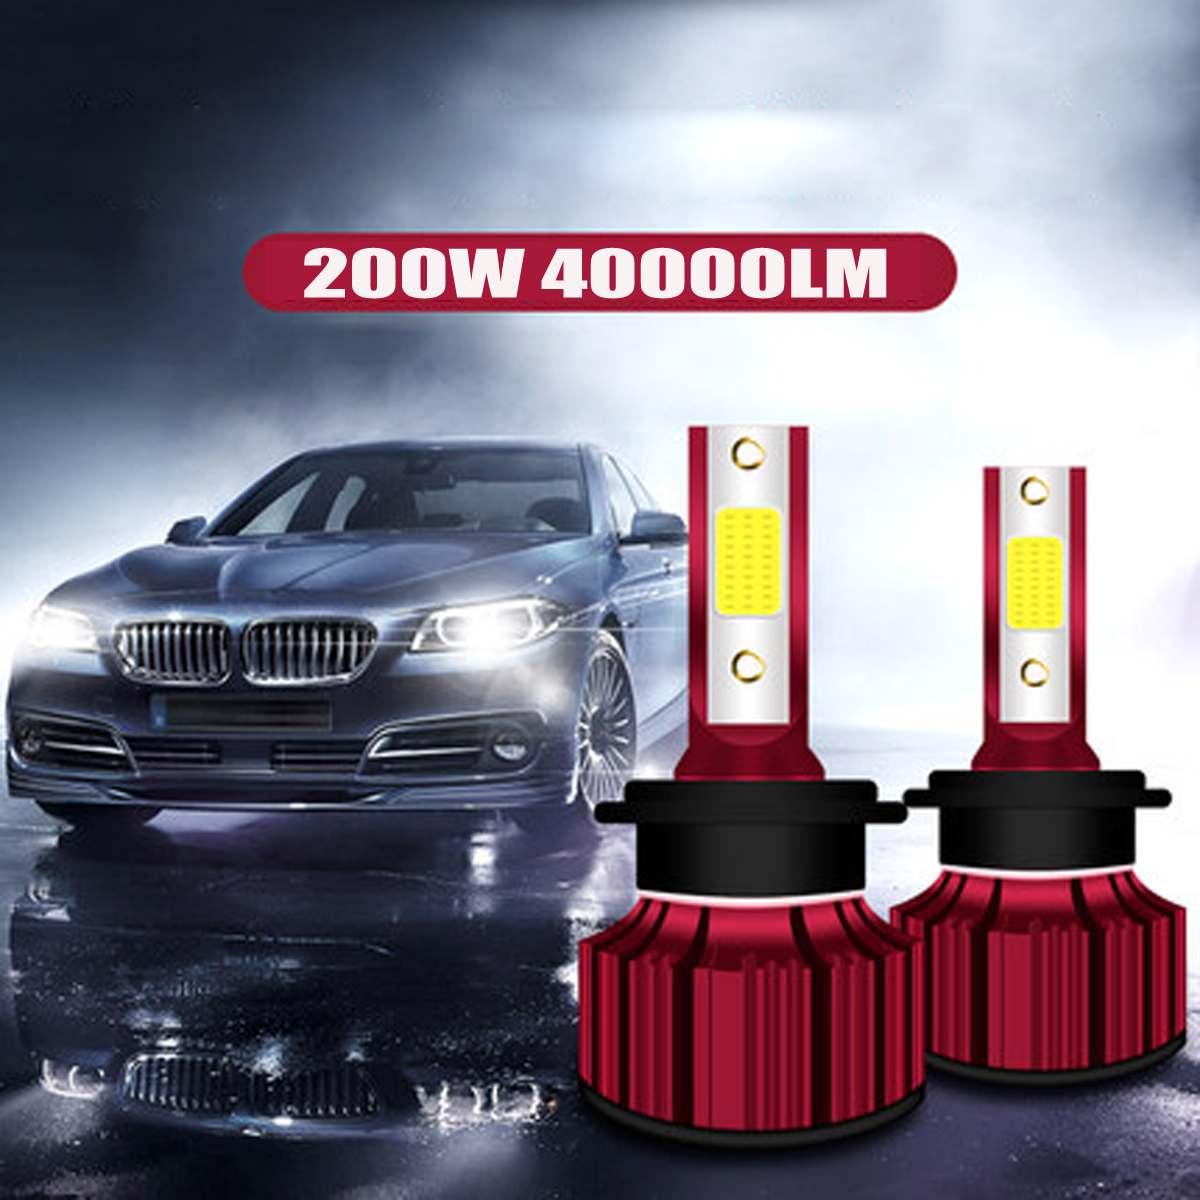 2x 40000LM Car LED Headlight Bubls Mini Headlight Kit for High Power Bulb fog Light 6000K White H7 H8 H9 H11 H4 9003 HB4